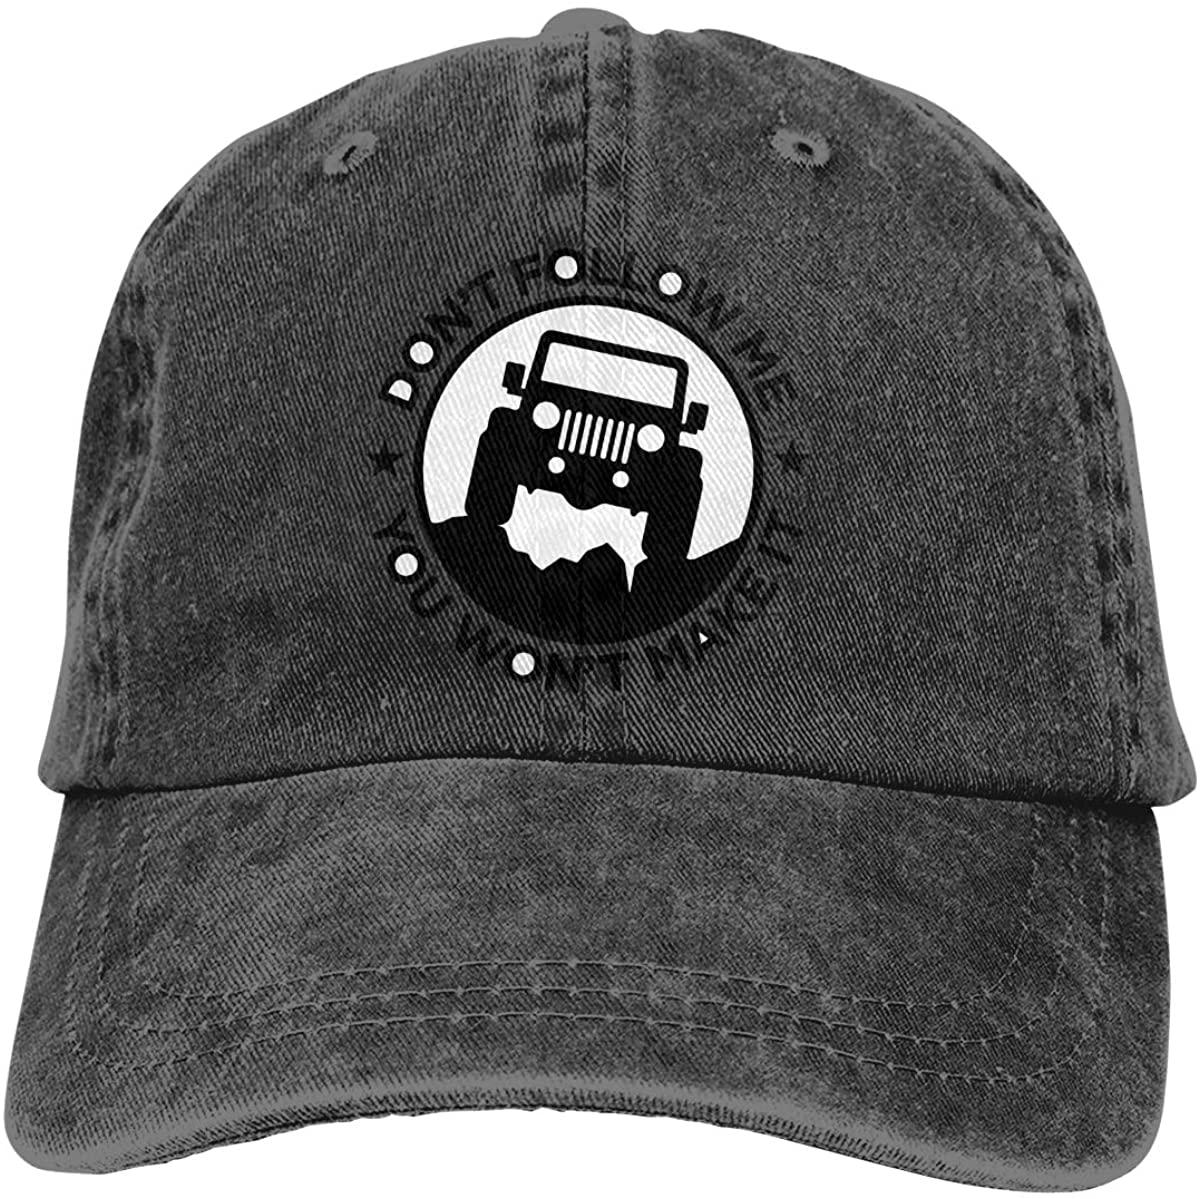 Washed Adjustable Baseball Cap Low Profile Dad Hats Men Women The Wave